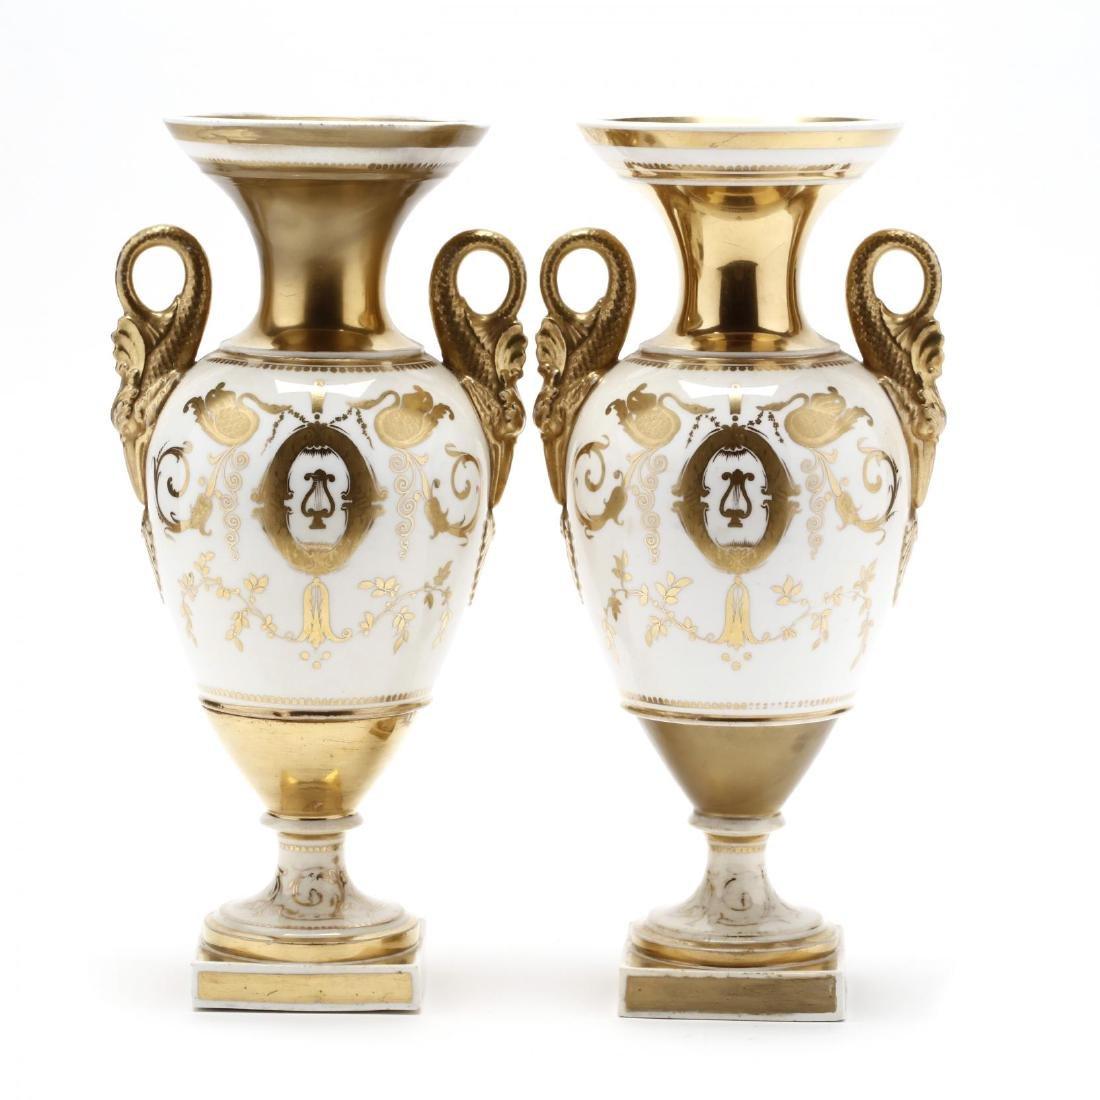 Pair of Early Swansea Gilt Vases - 2